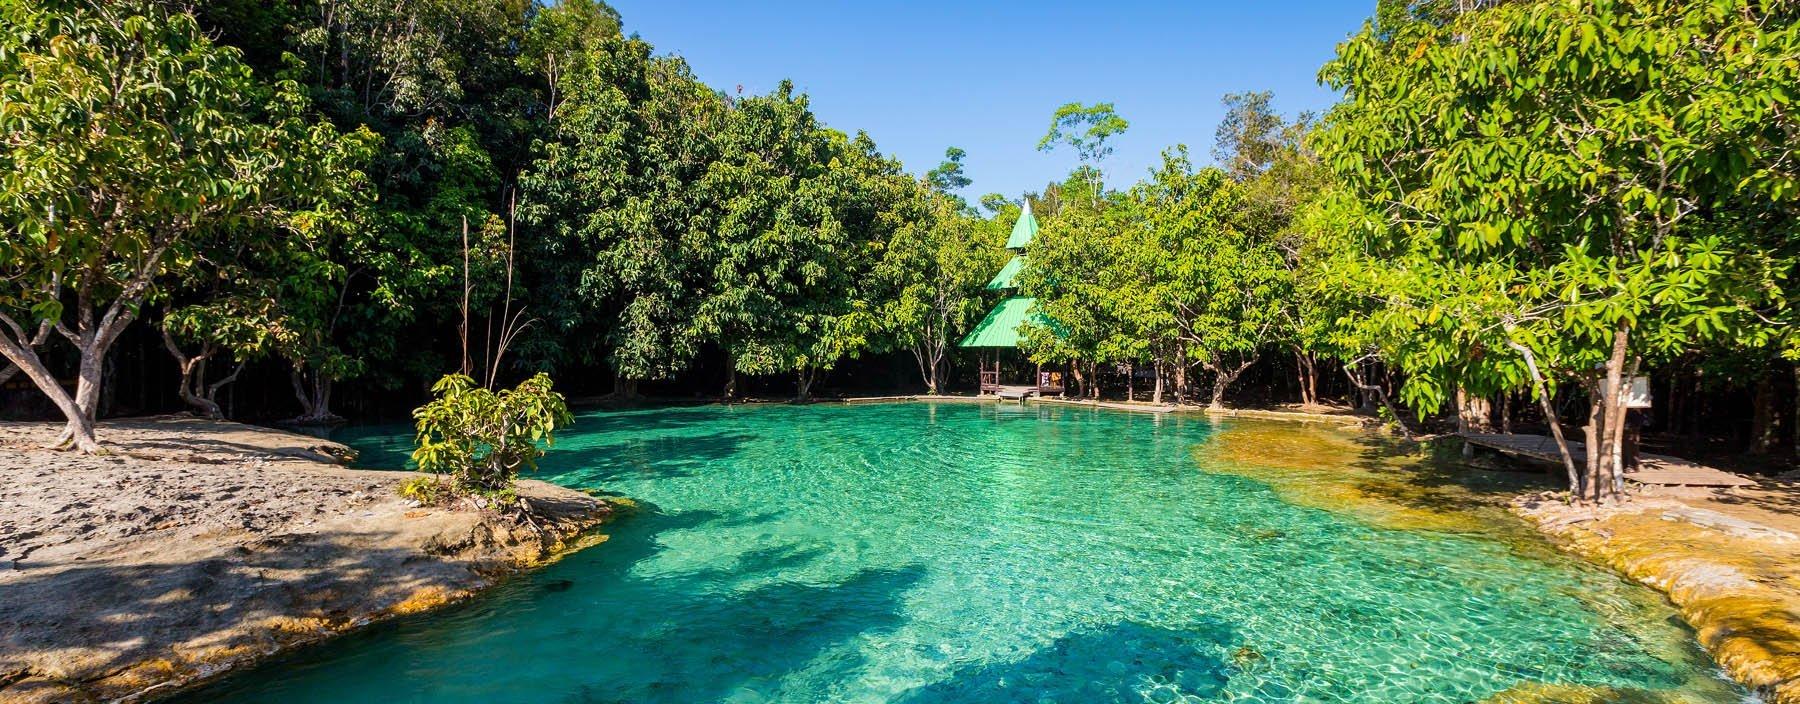 thailand, krabi, emerald pool (1).jpg